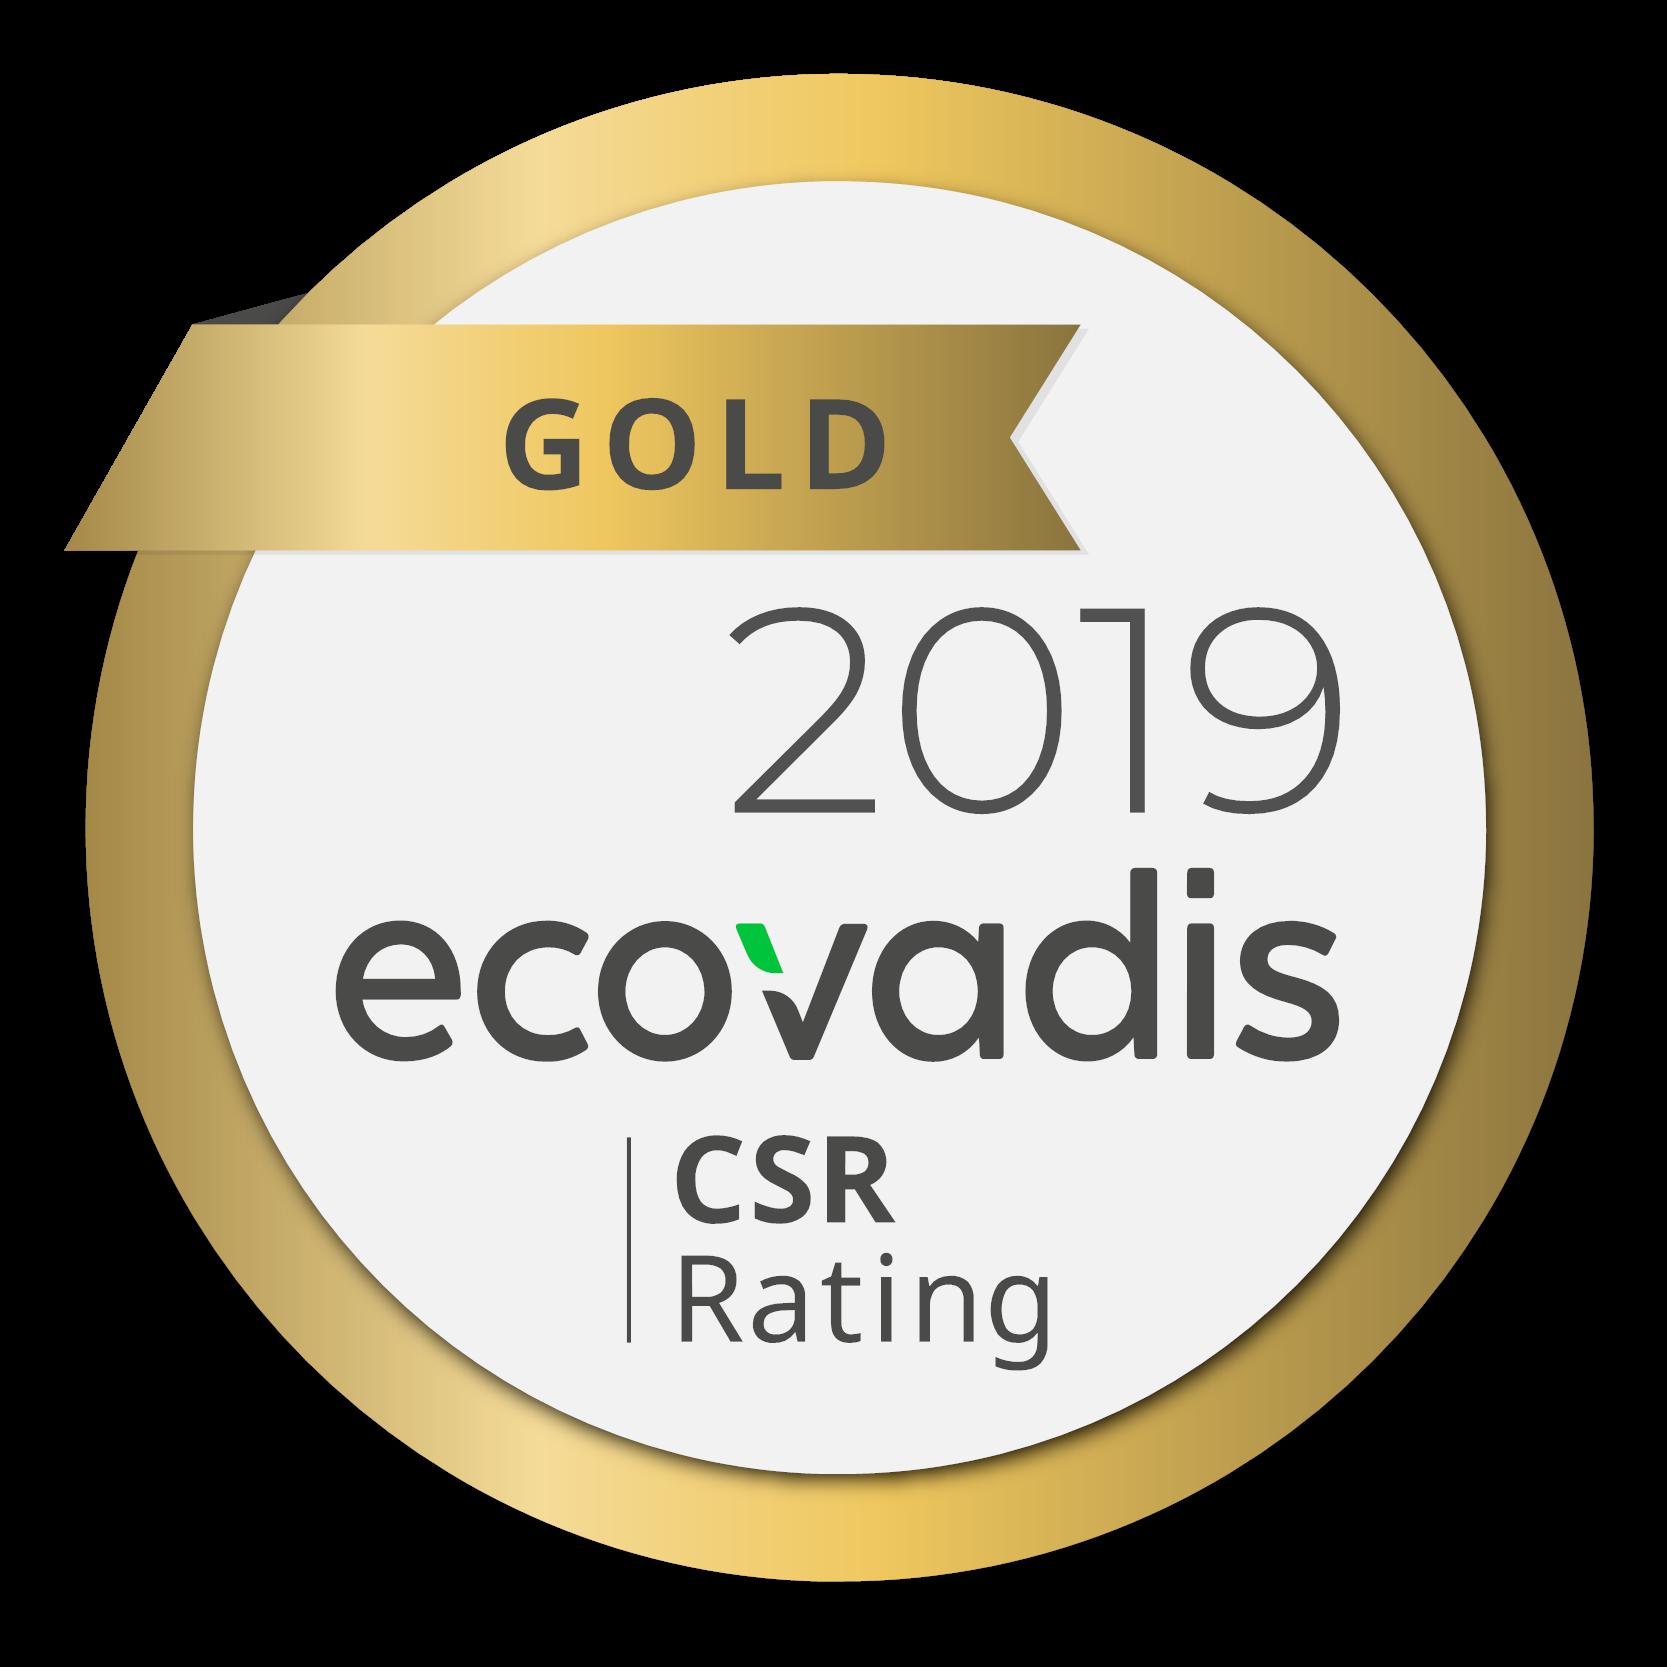 eco-vadis-gold-rating.png